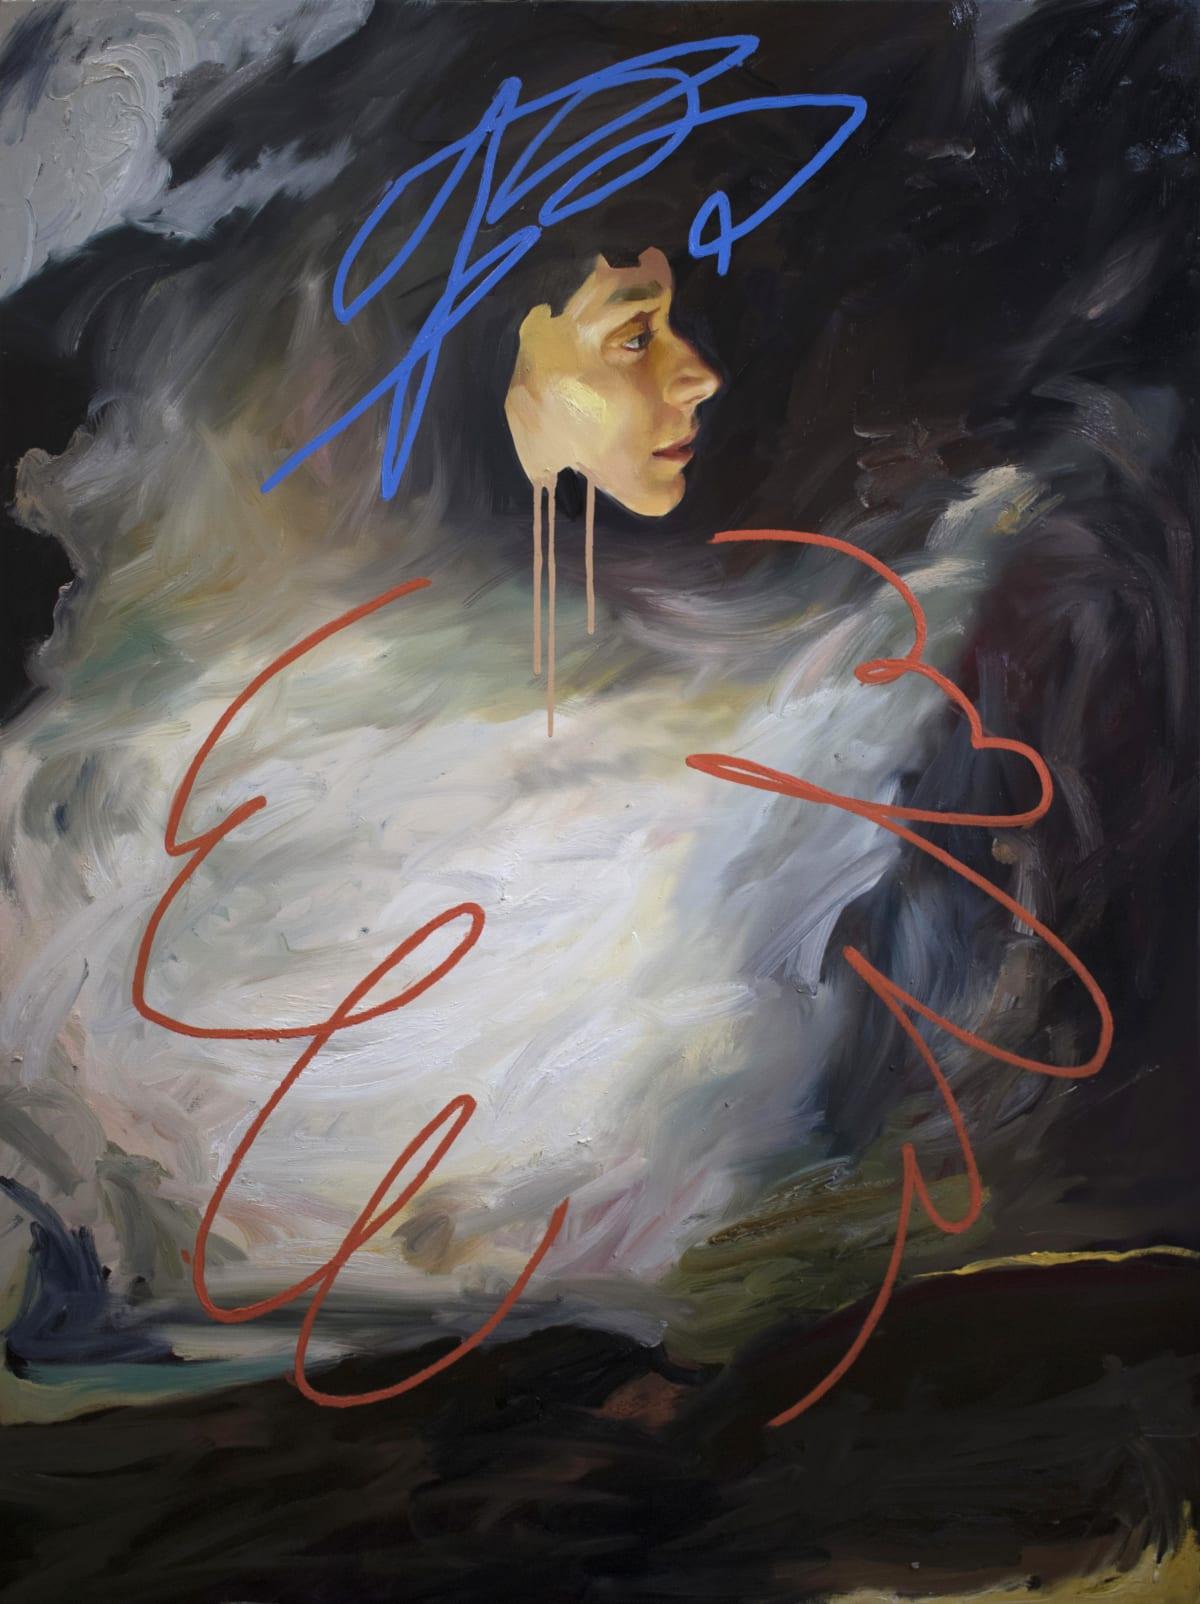 Loribelle Spirovski, Sturm and Drang, 2019